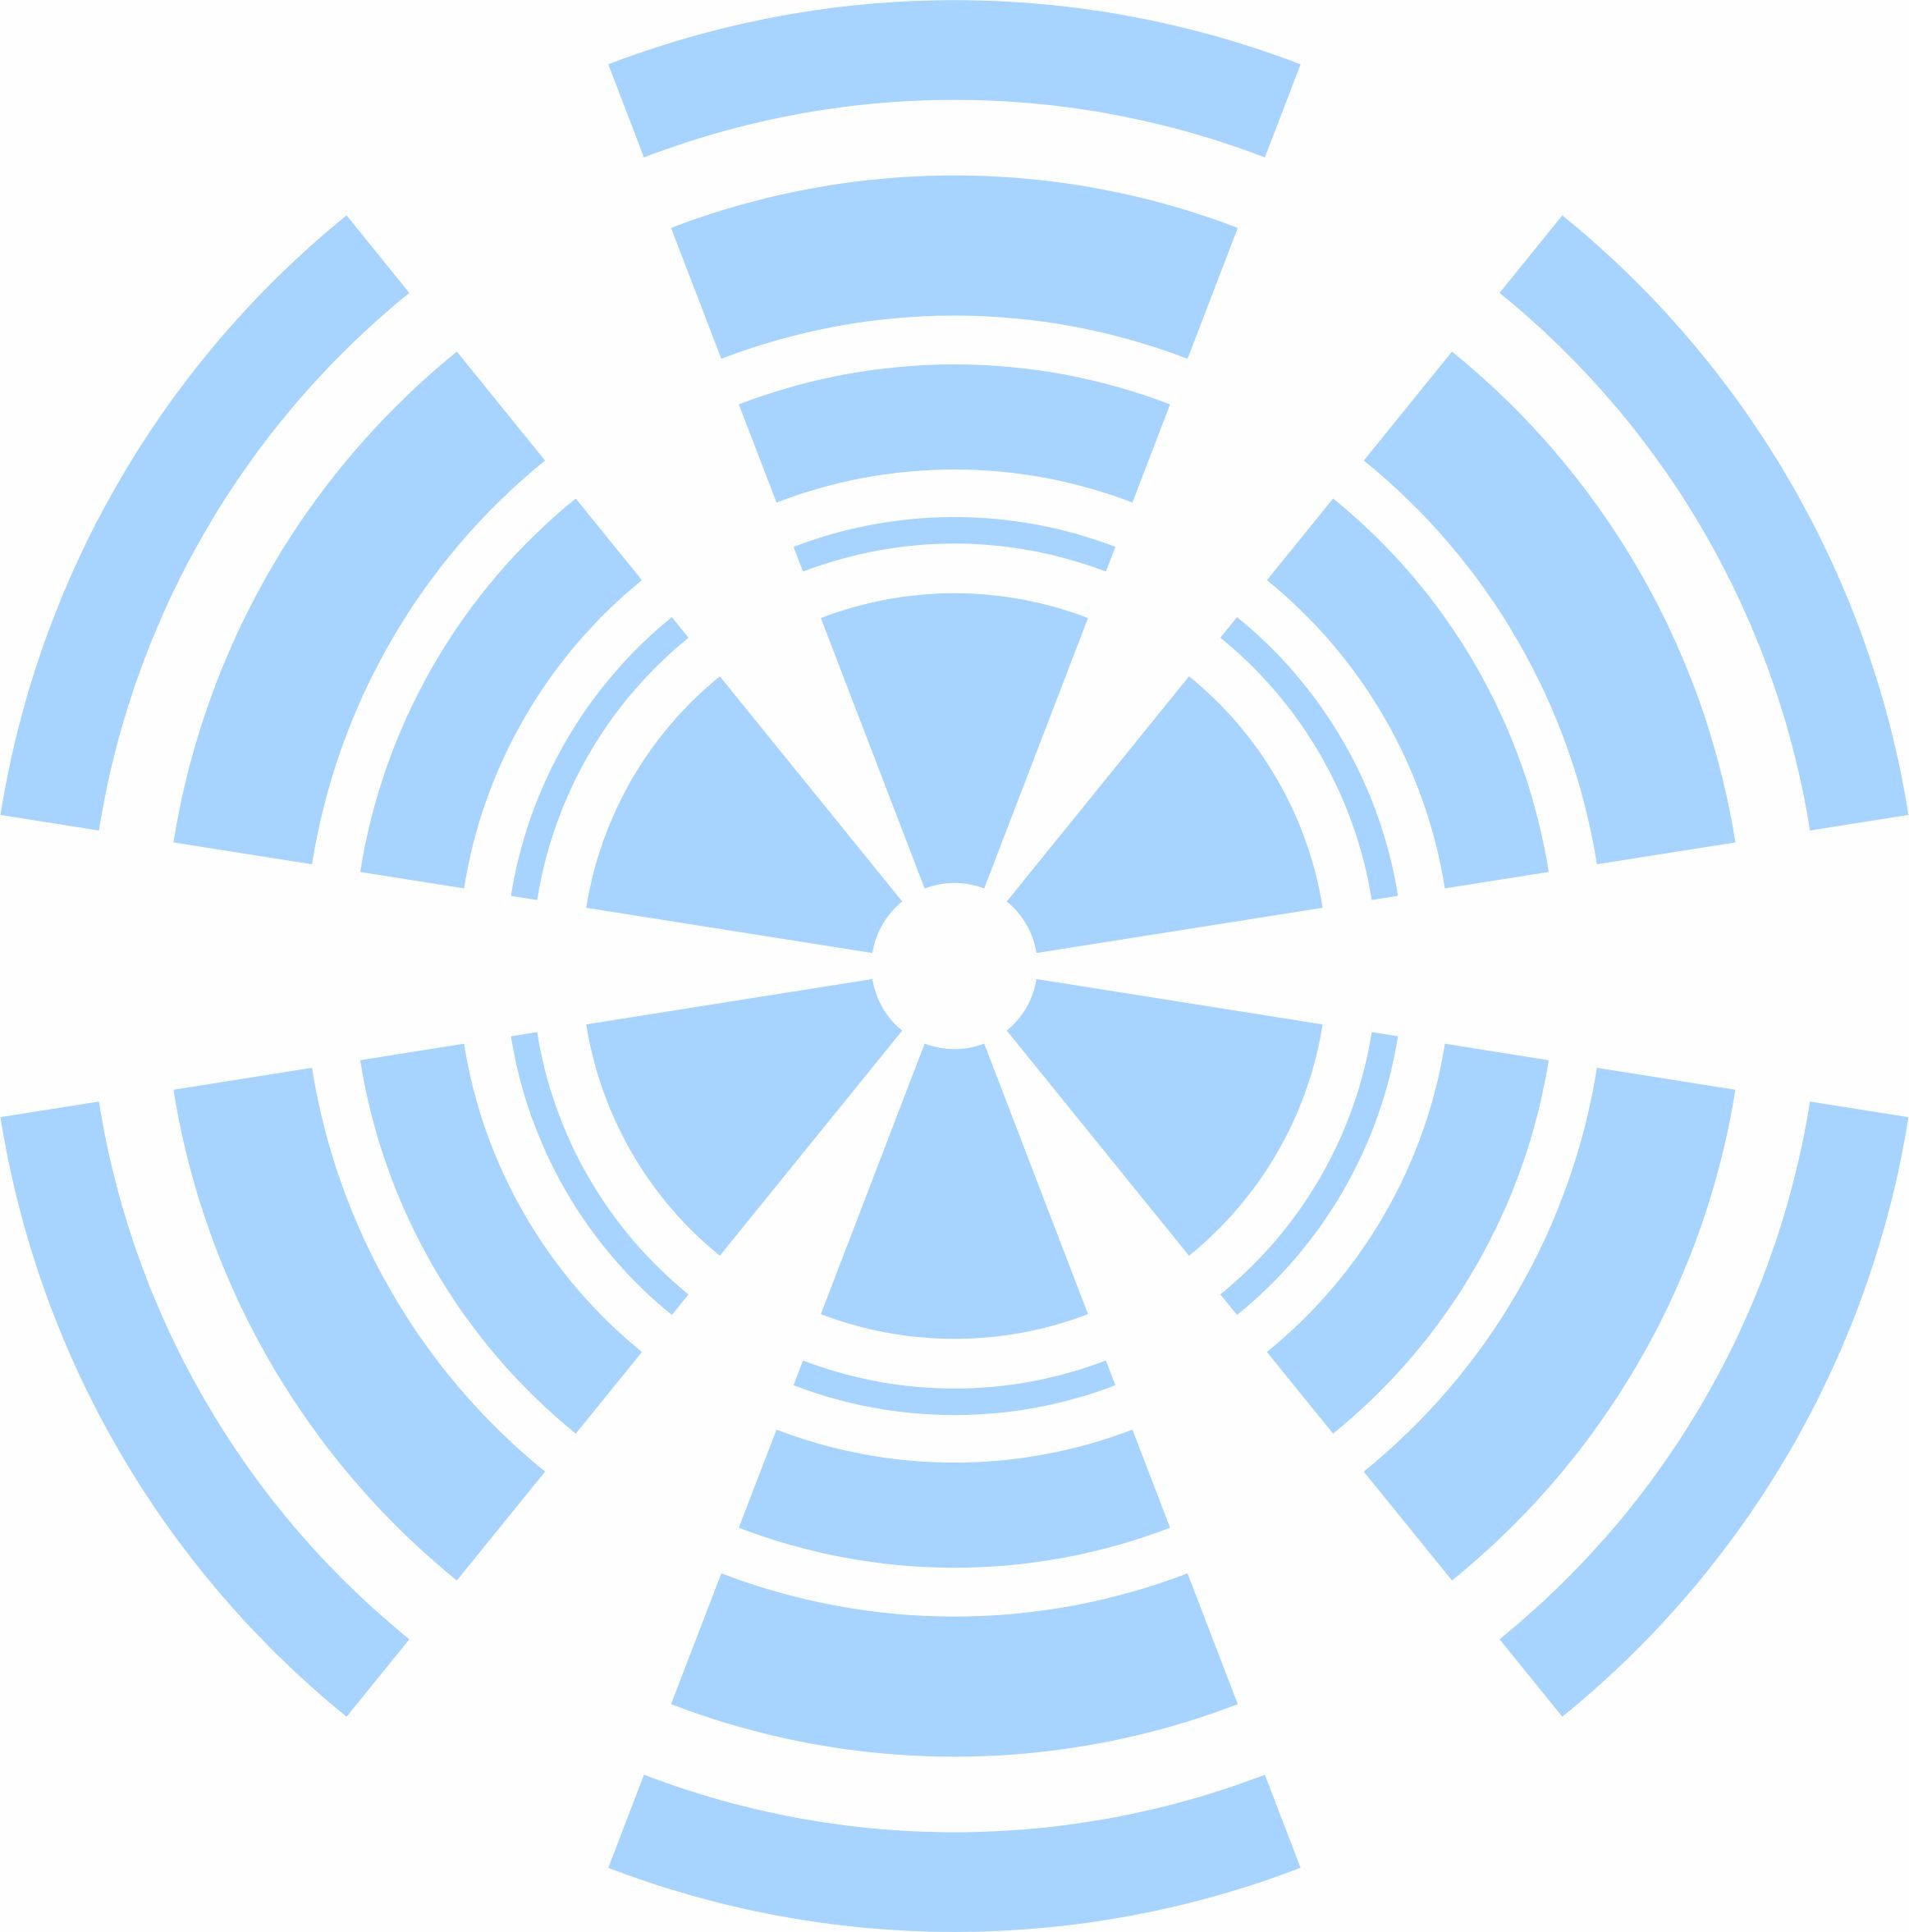 Logotip_Zvezda_lui_03jpg